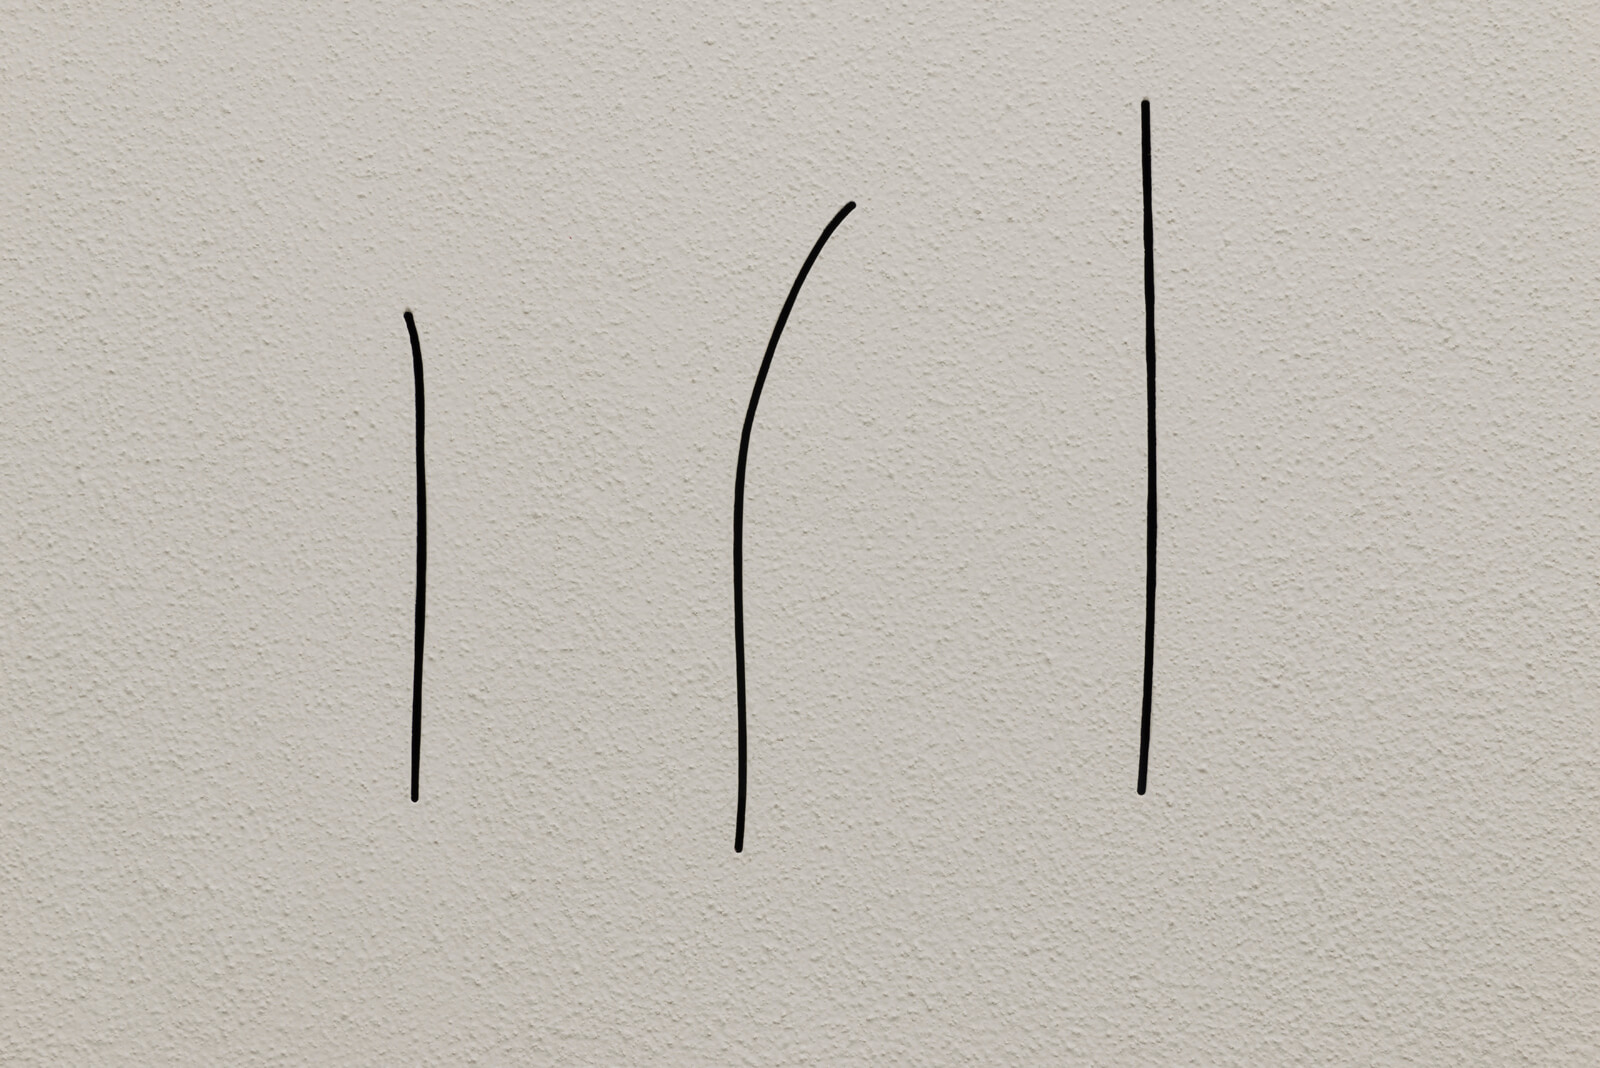 6c_balula-vent-hhh-3-2016